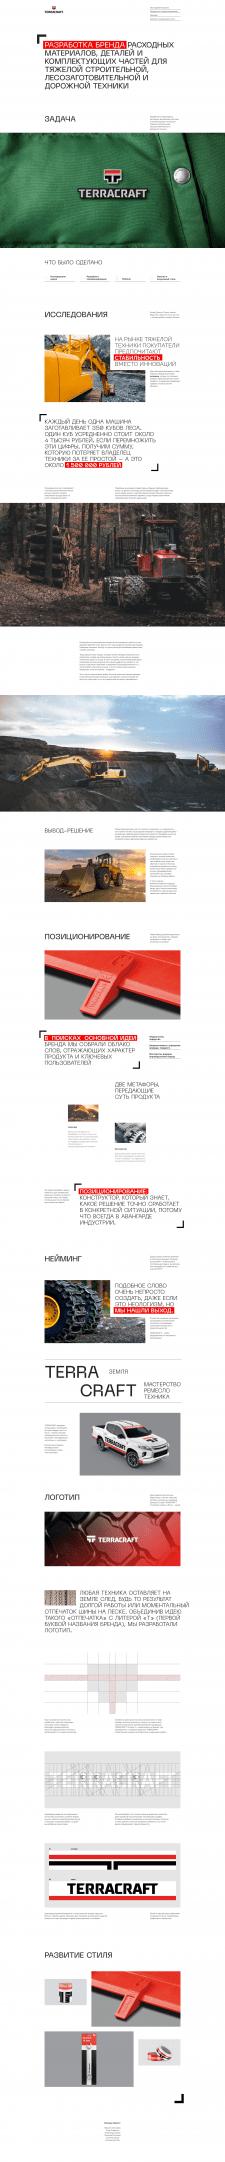 Terracraft. Редизайн презентации брендинга